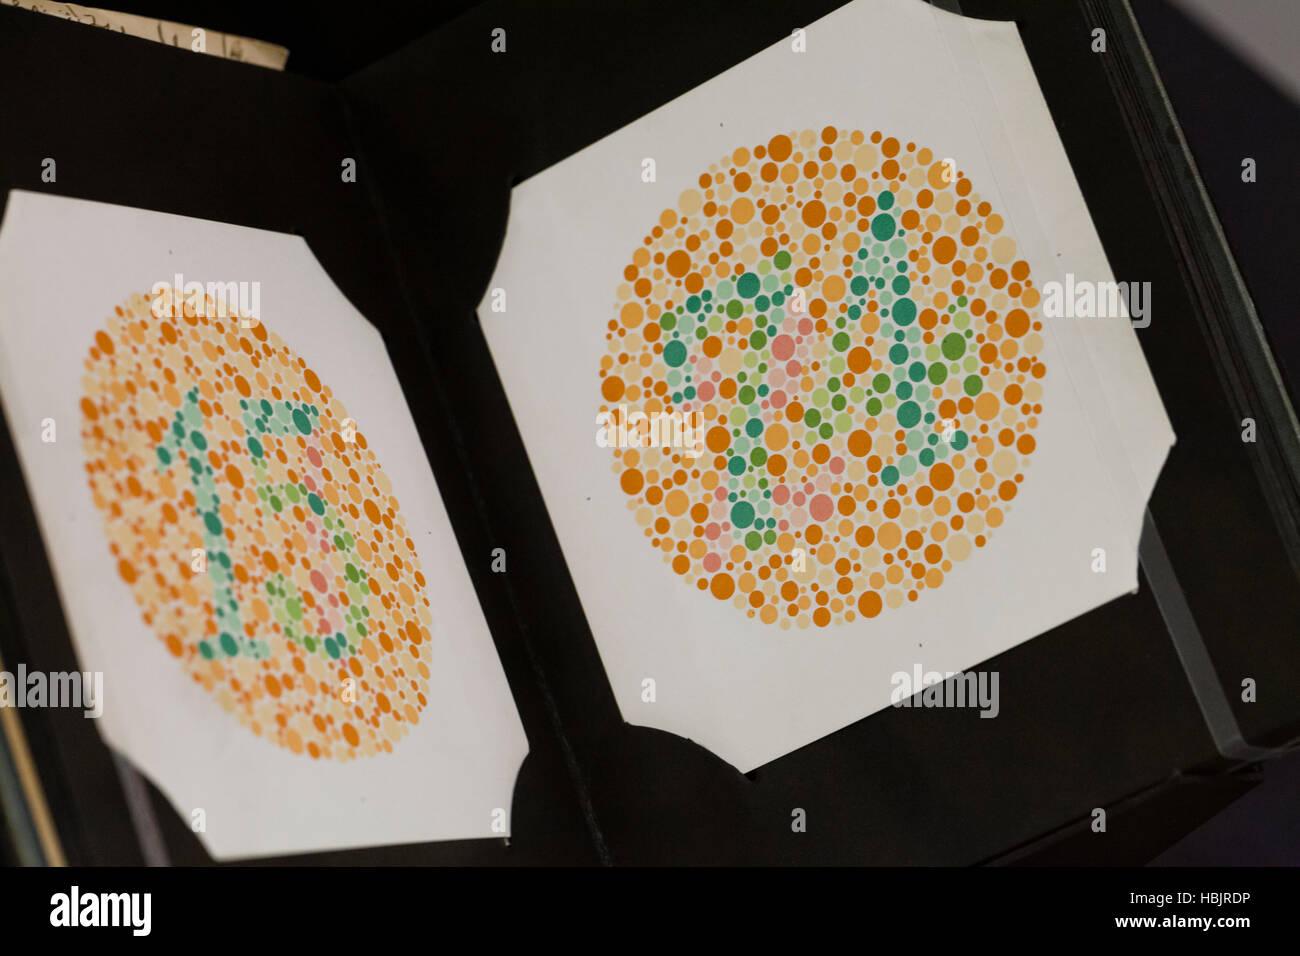 Ishihara color perception test chart - USA - Stock Image